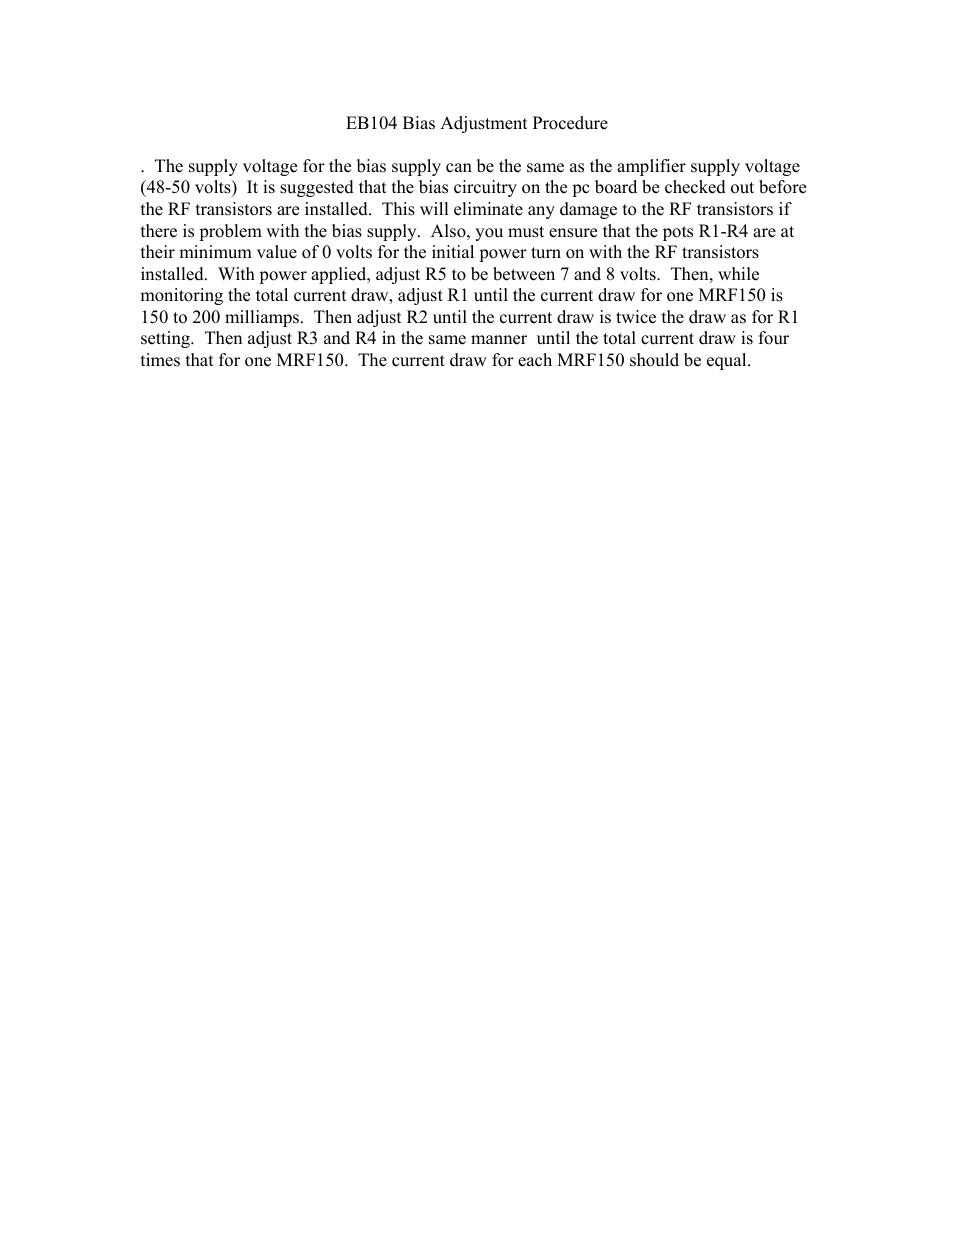 Communication Concepts EB104 Bias Setting User Manual | 1 page